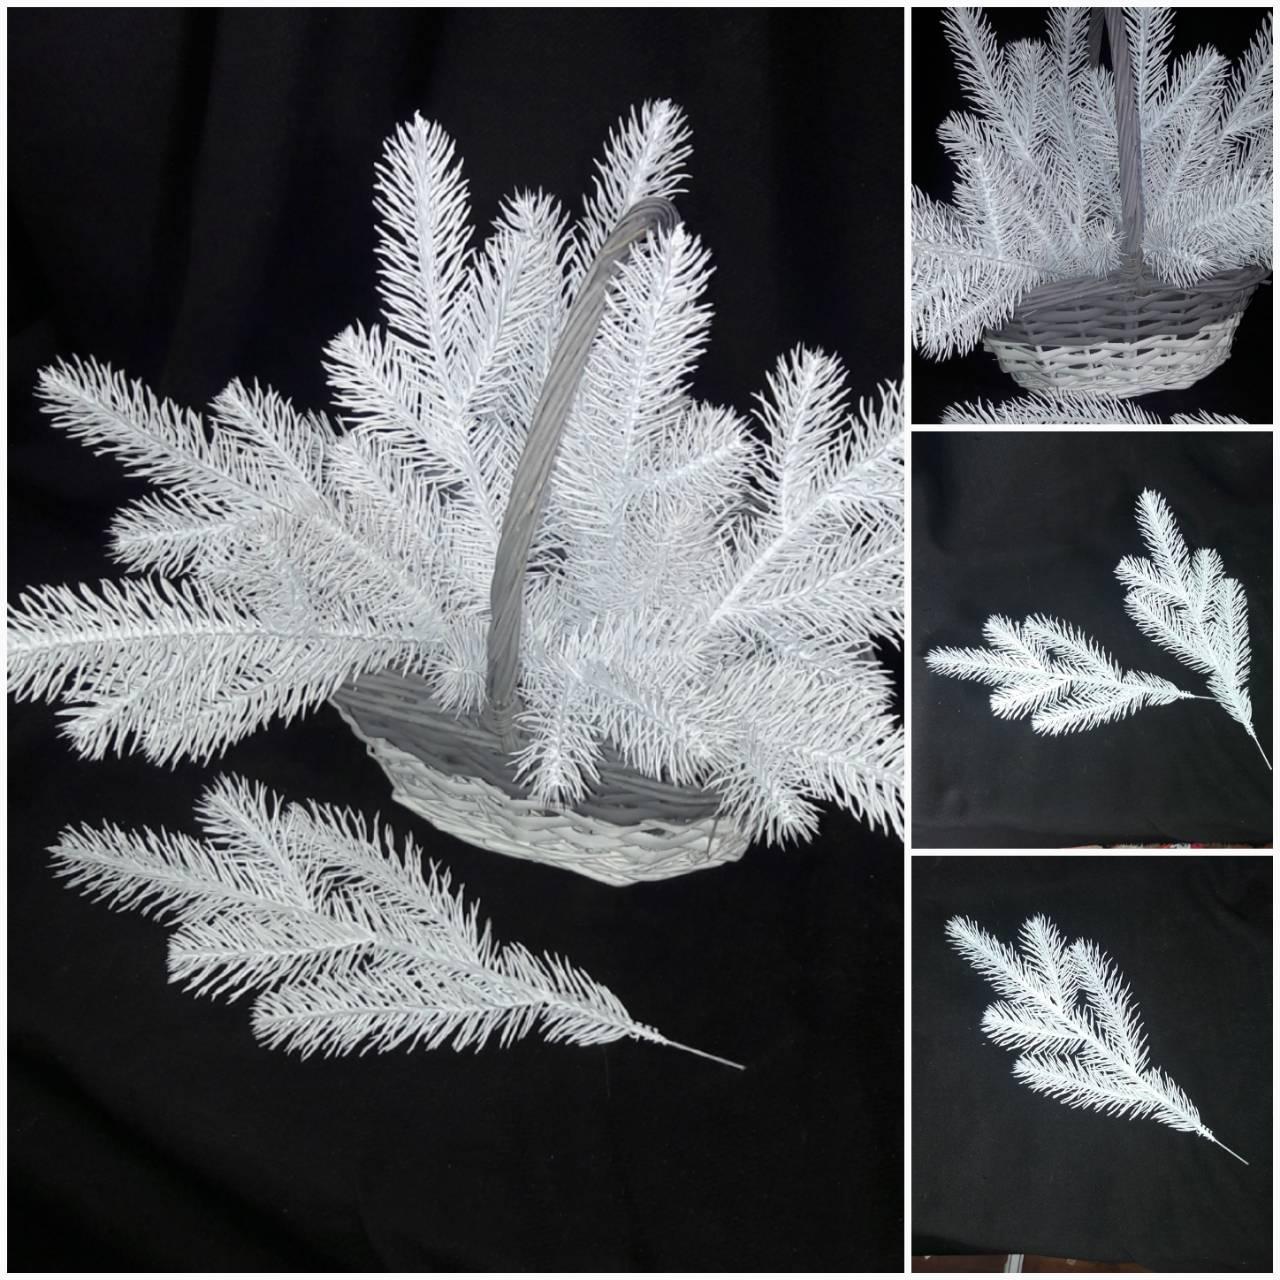 Декоративная ветка ели, цвет - белый, литая из пластика, 30 см., 14/10 (цена за 1 шт. + 4 гр.)